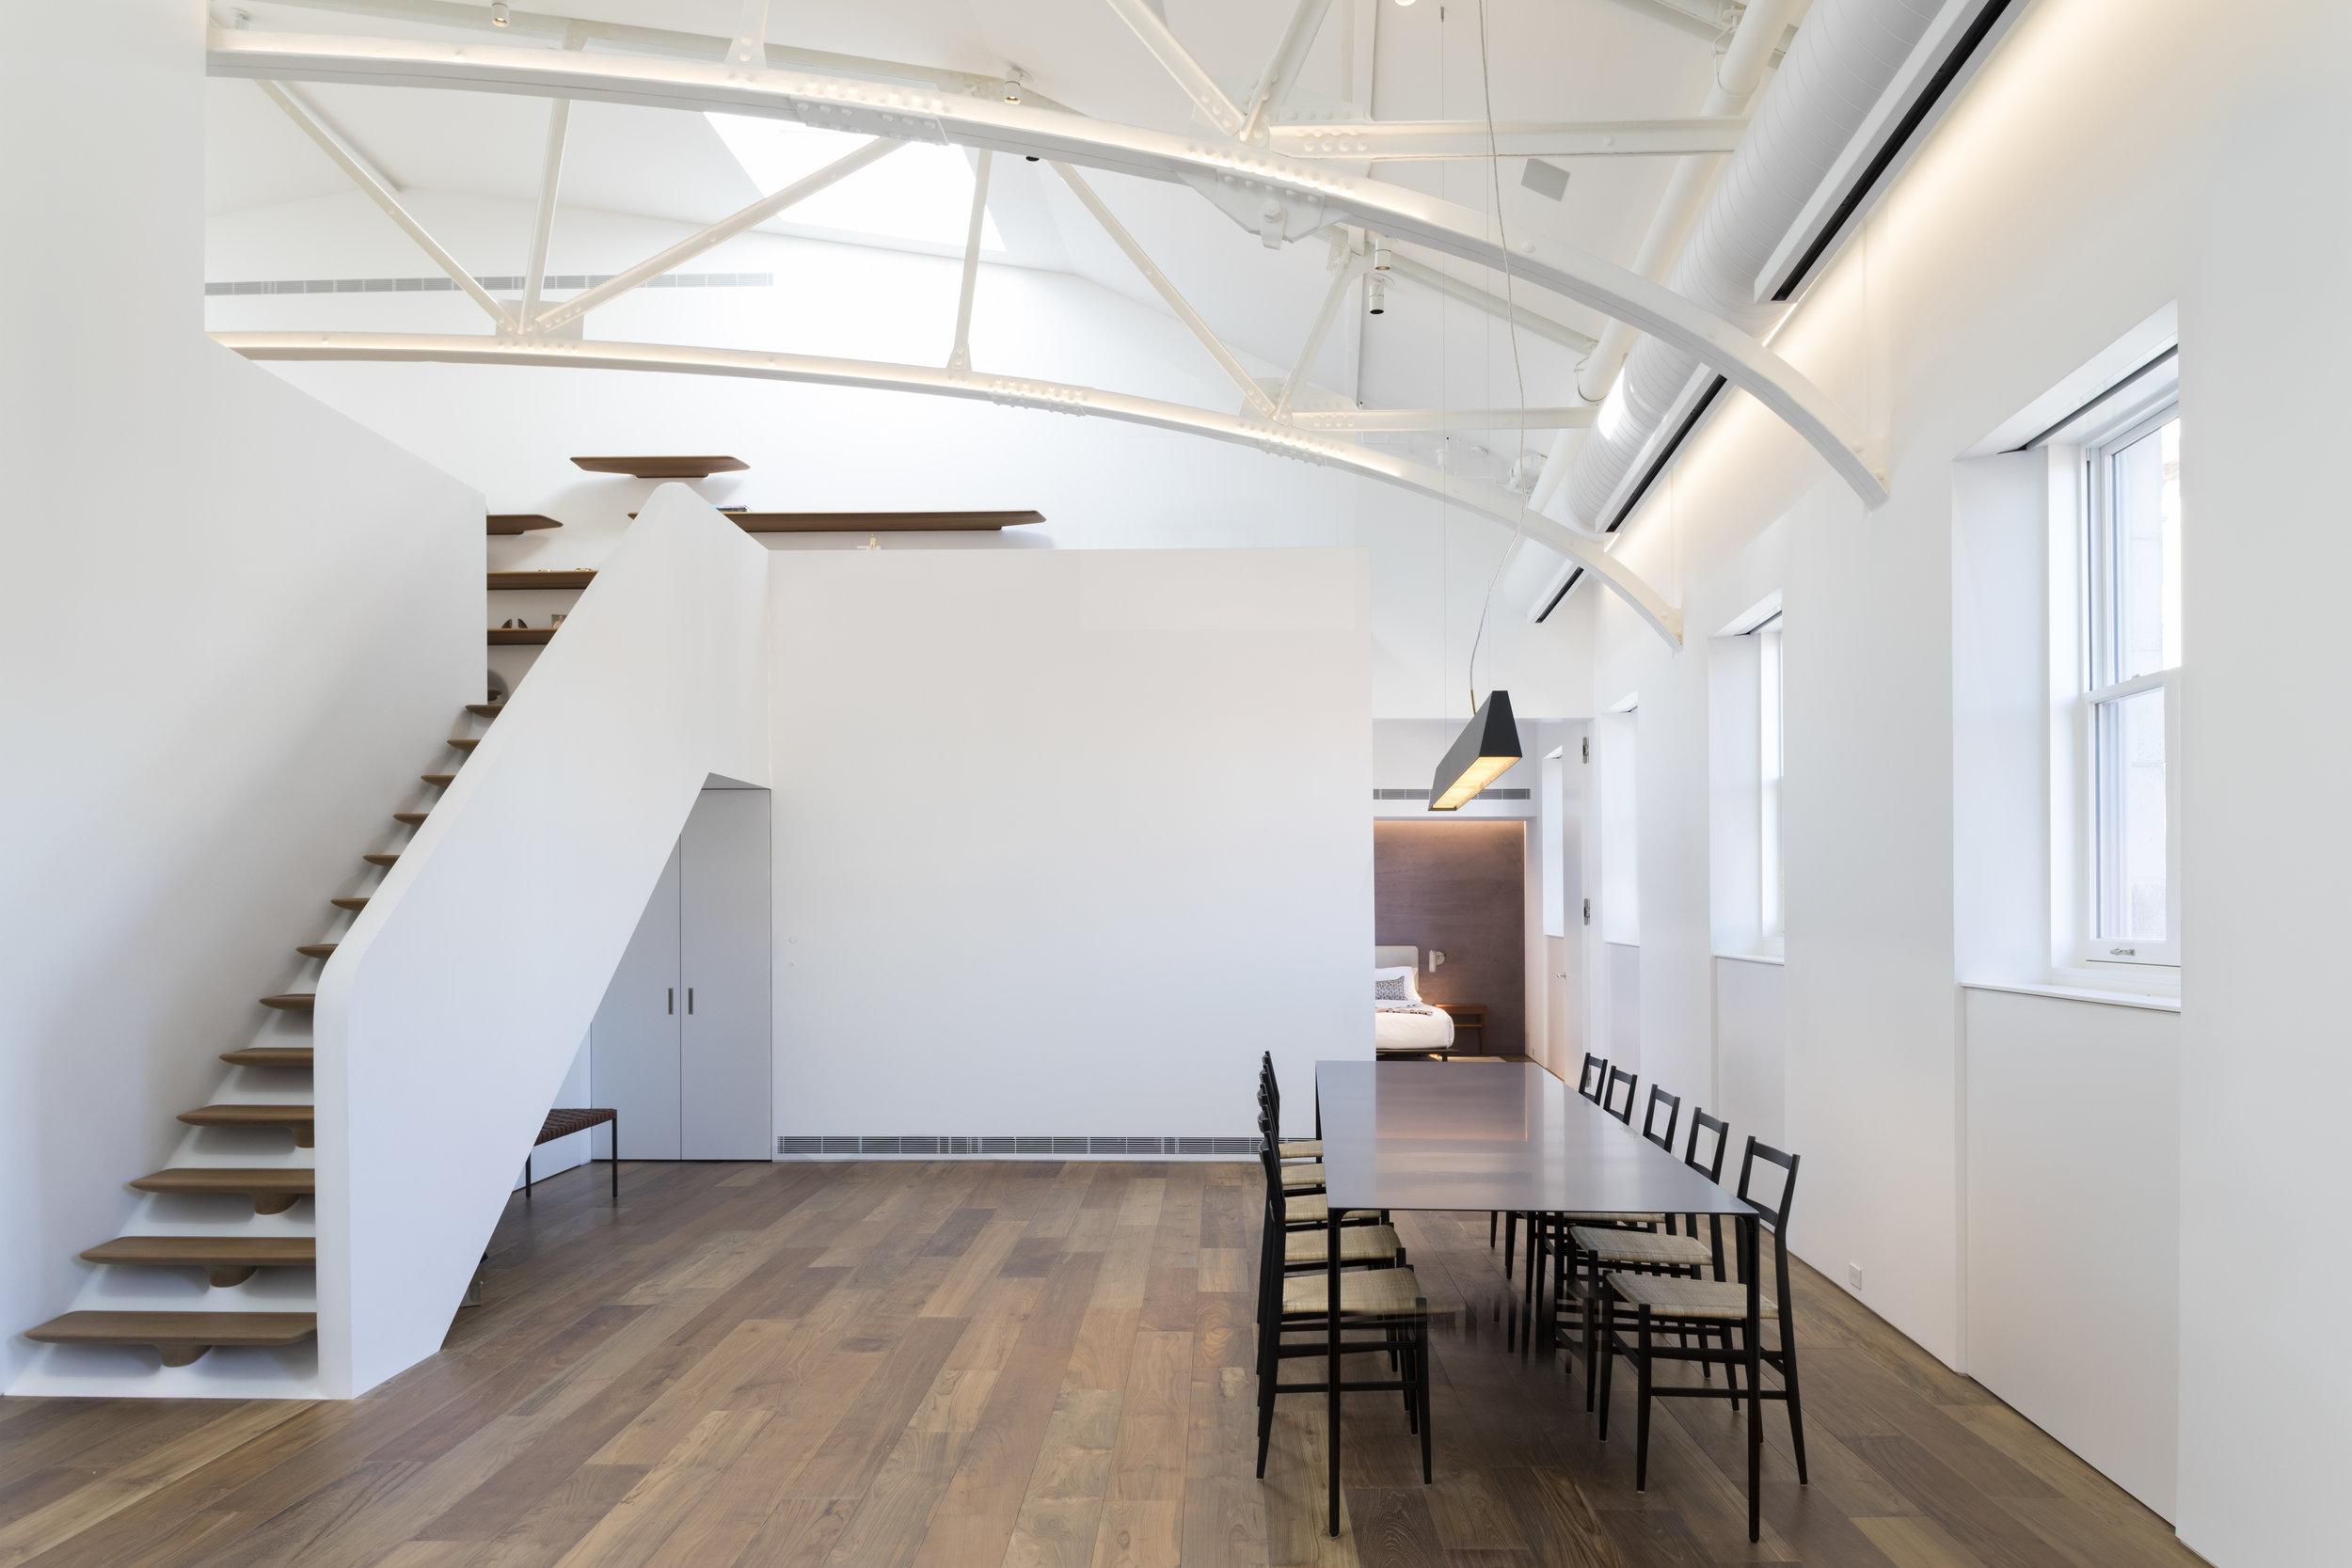 Police-Building-Apartment_Selldorf-Architects_Nicholas-Venezia_02.jpg